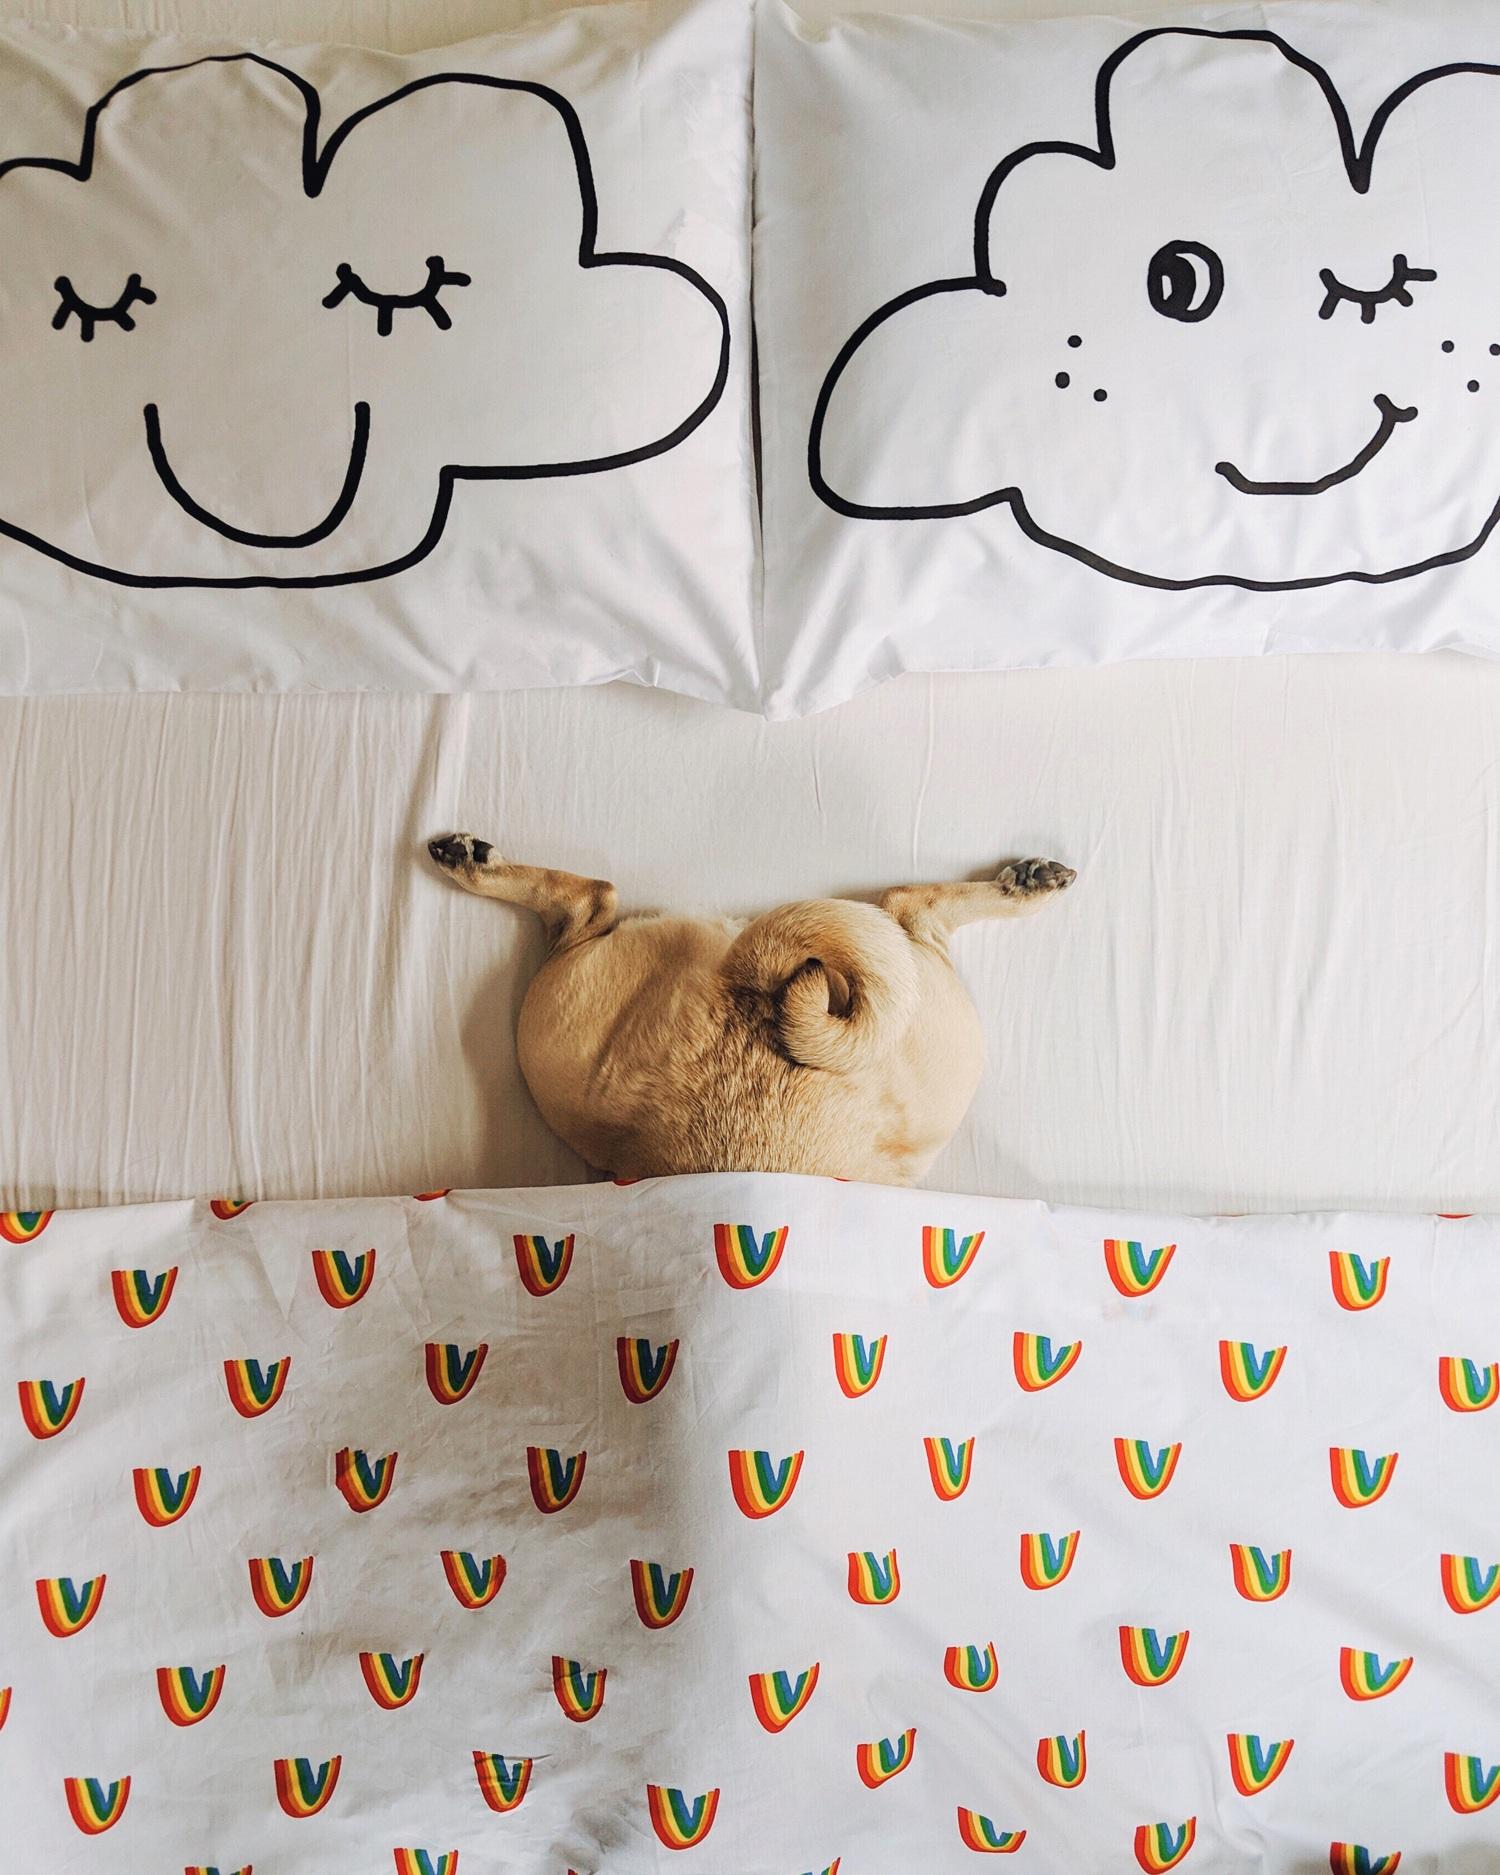 pug-puglife-dogblog-homeinspo-dogfriendly-lifestyle-newyork+2.jpg